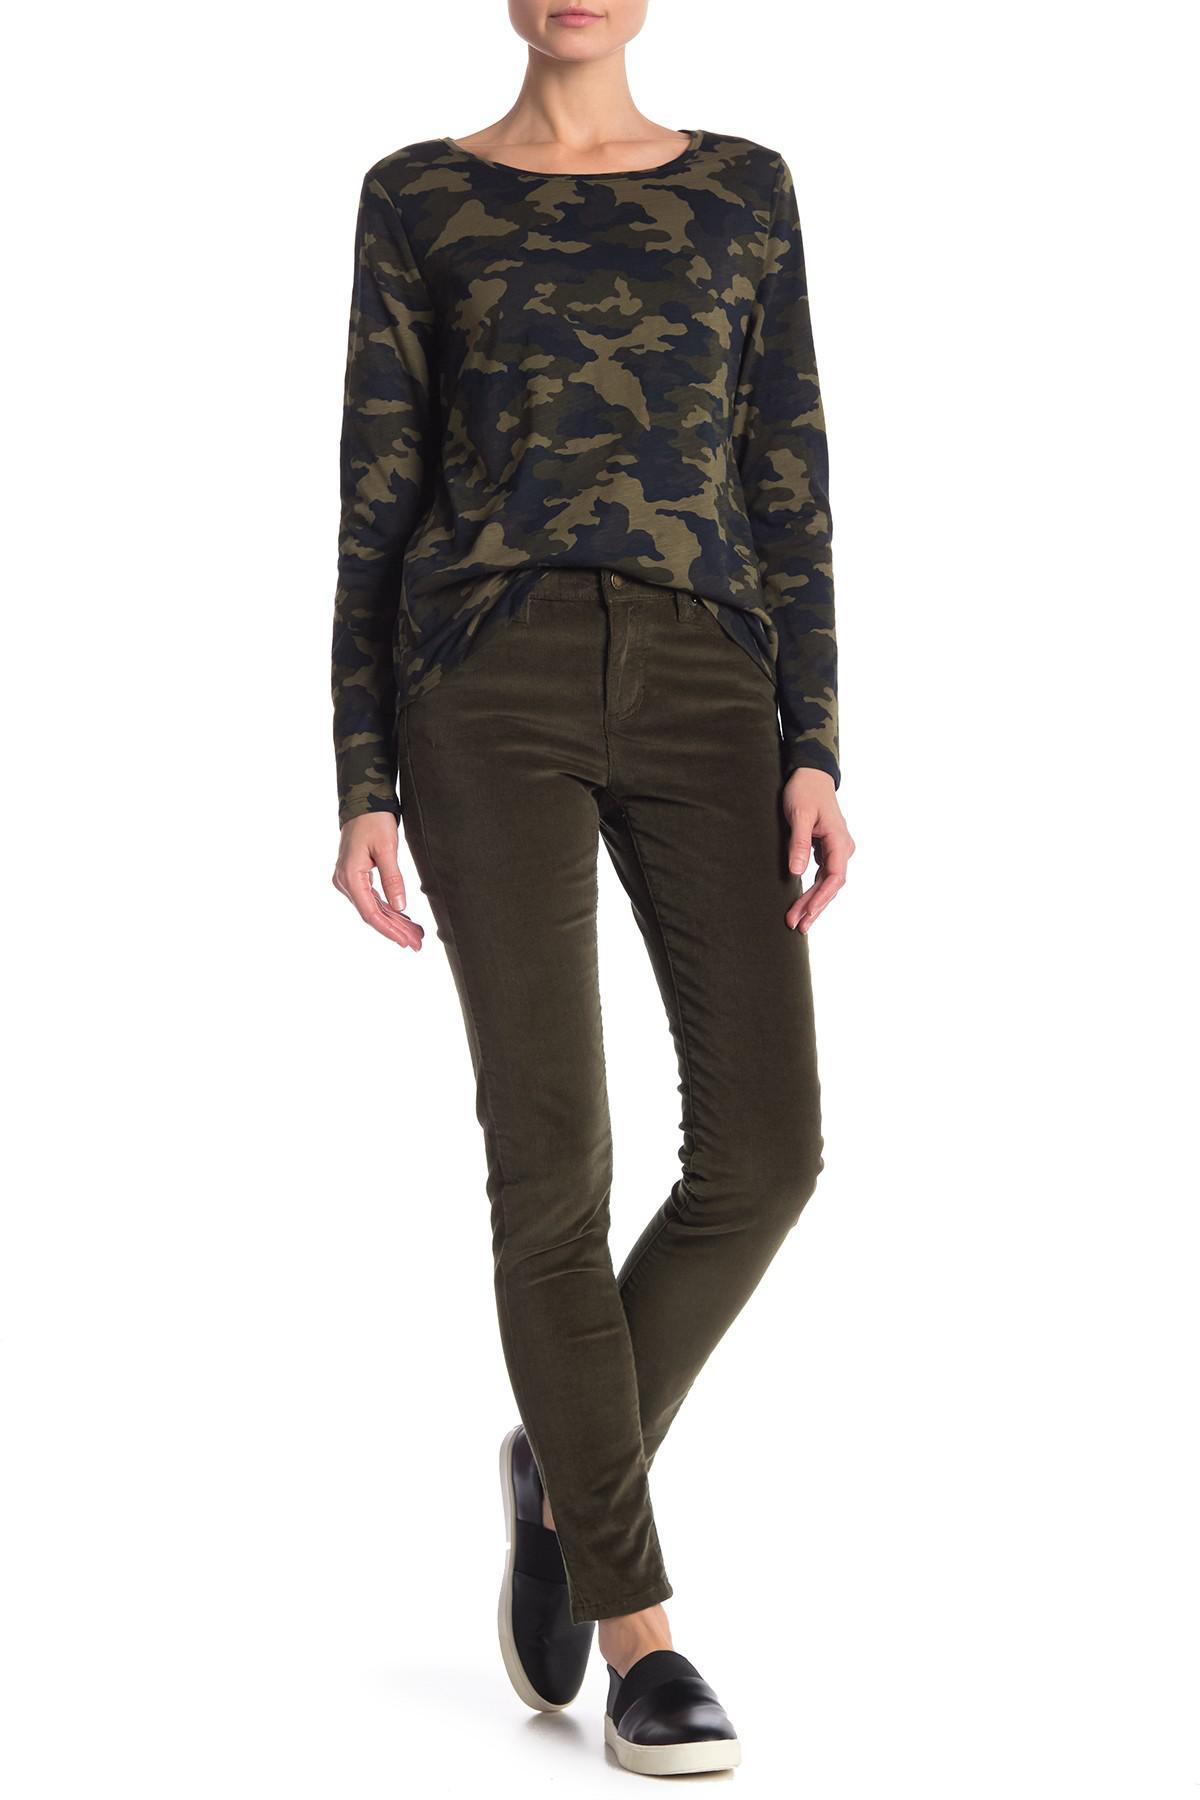 e9dc6f72e569c Lyst - Joe Fresh Slim Fit Corduroy Jeans in Green